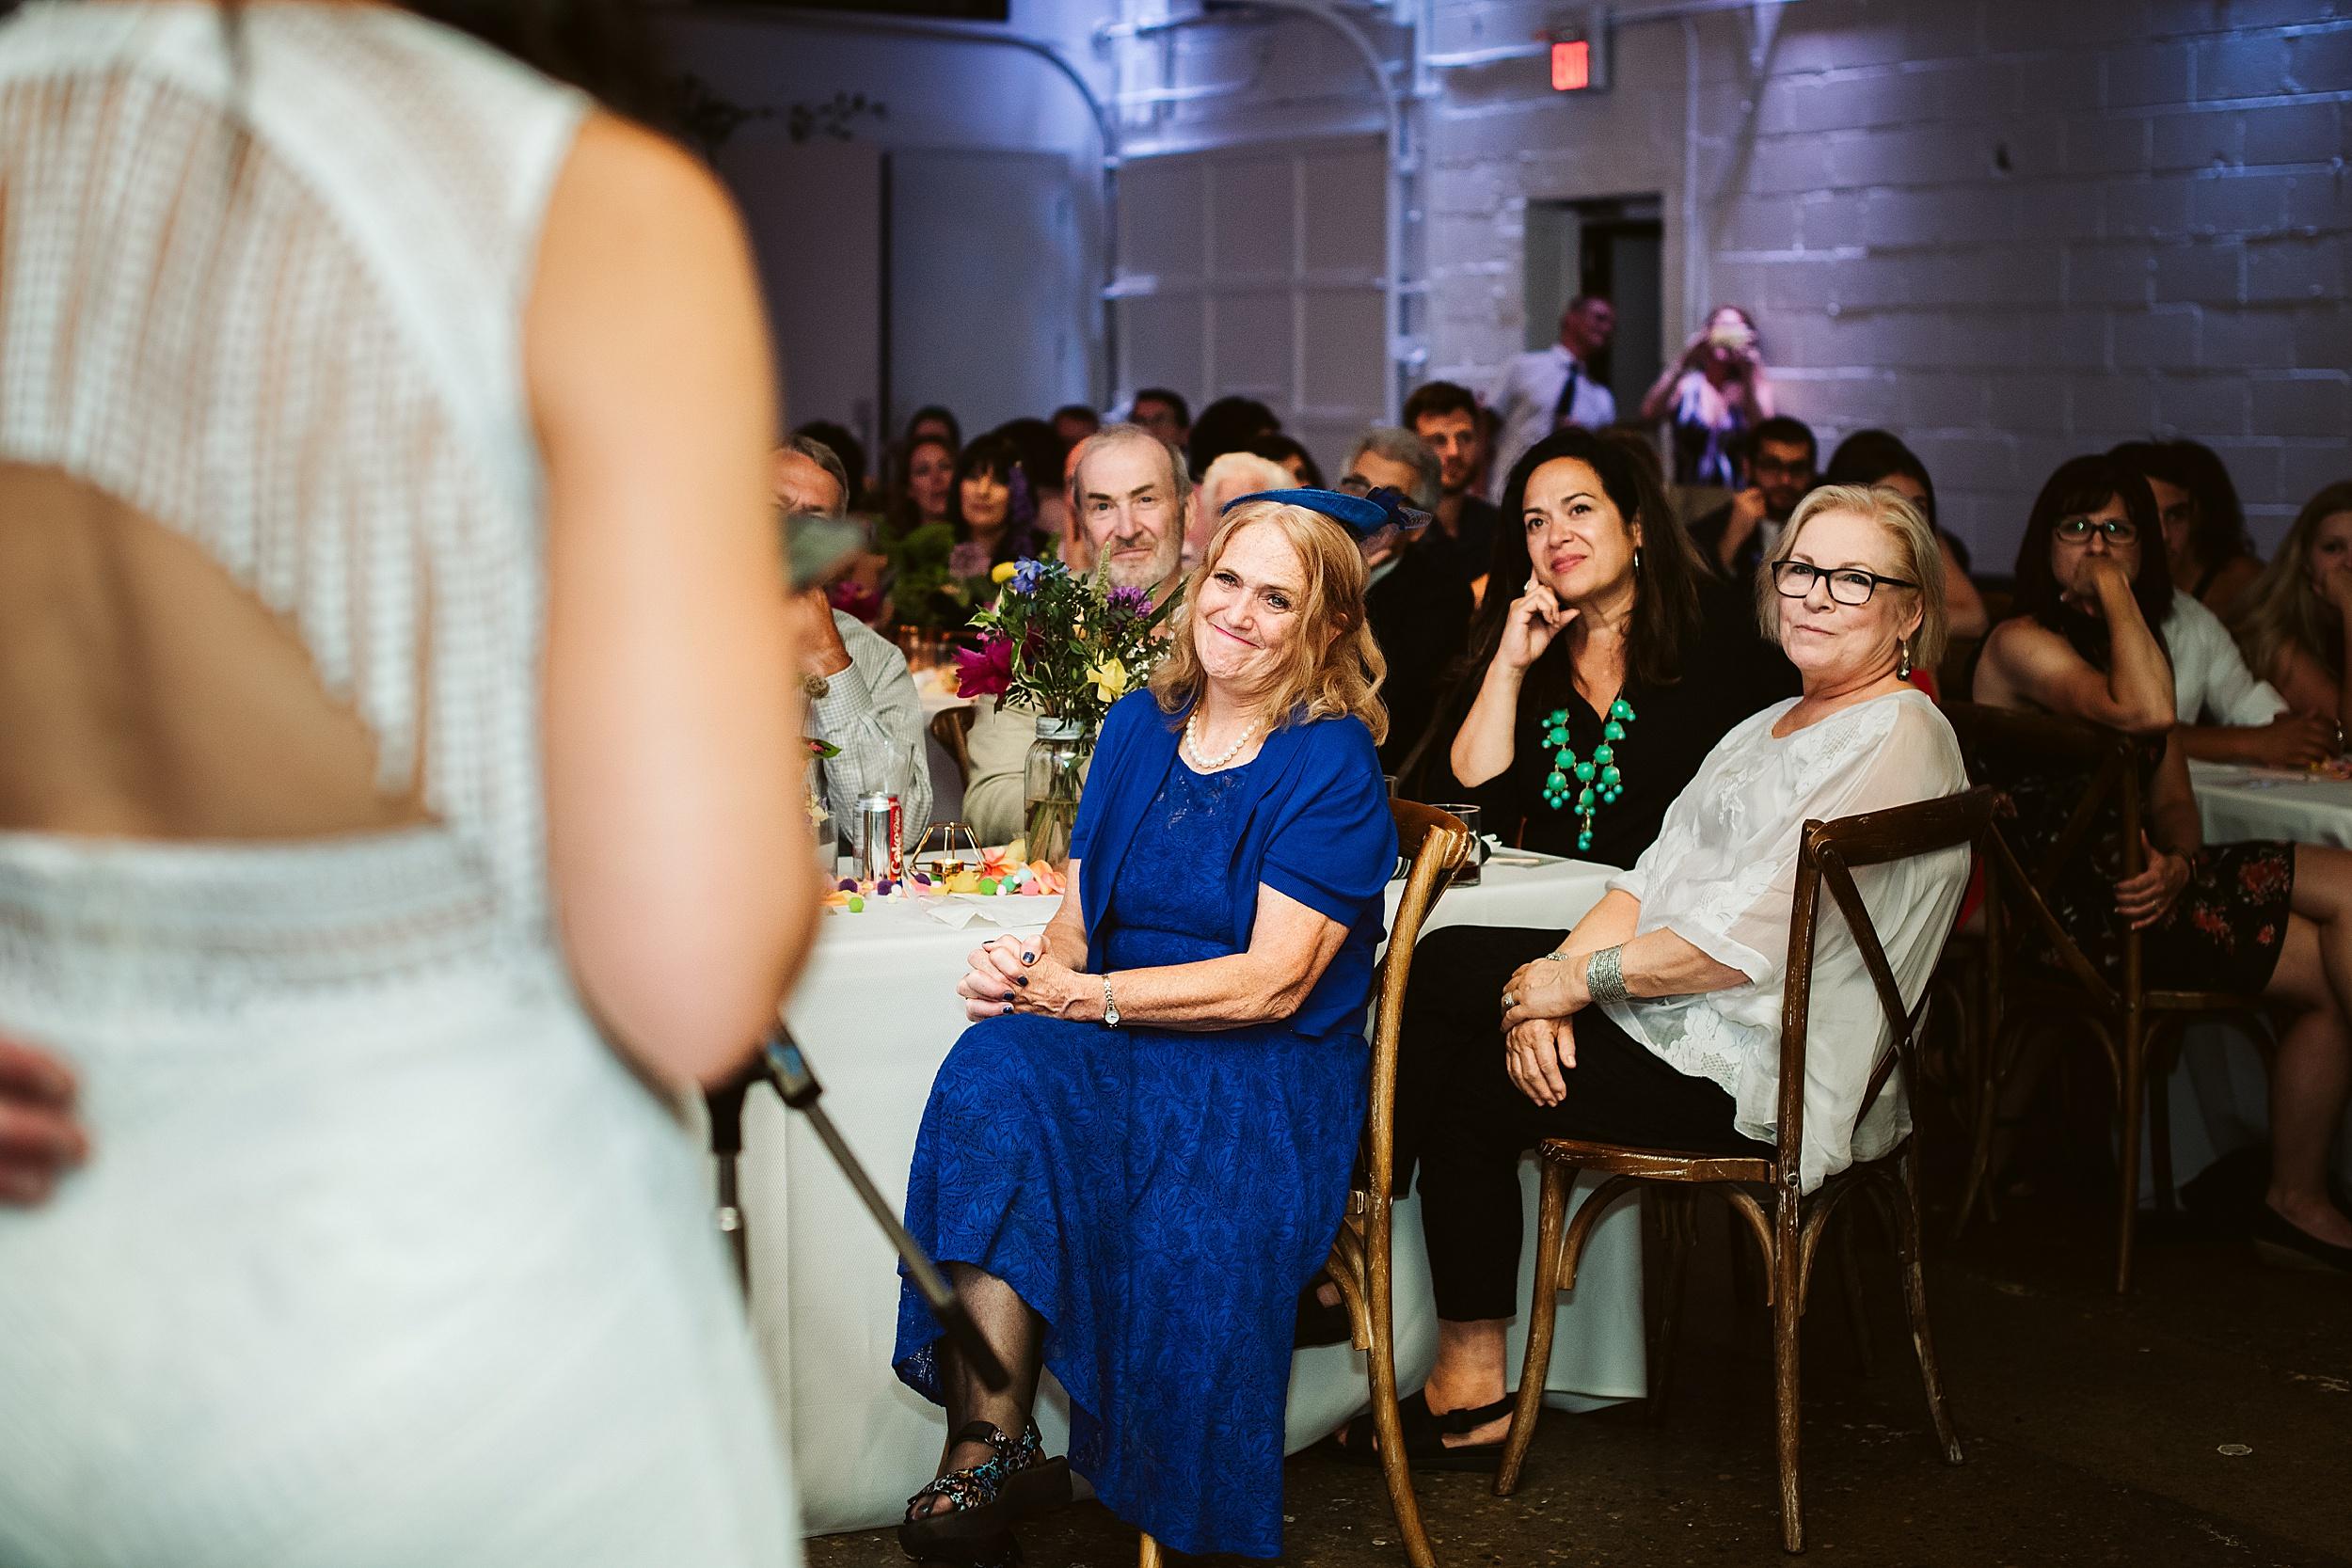 Airship-37-Berkeley-Events-Distillery-District-Wedding-Toronto-Wedding-Photographers_0093.jpg